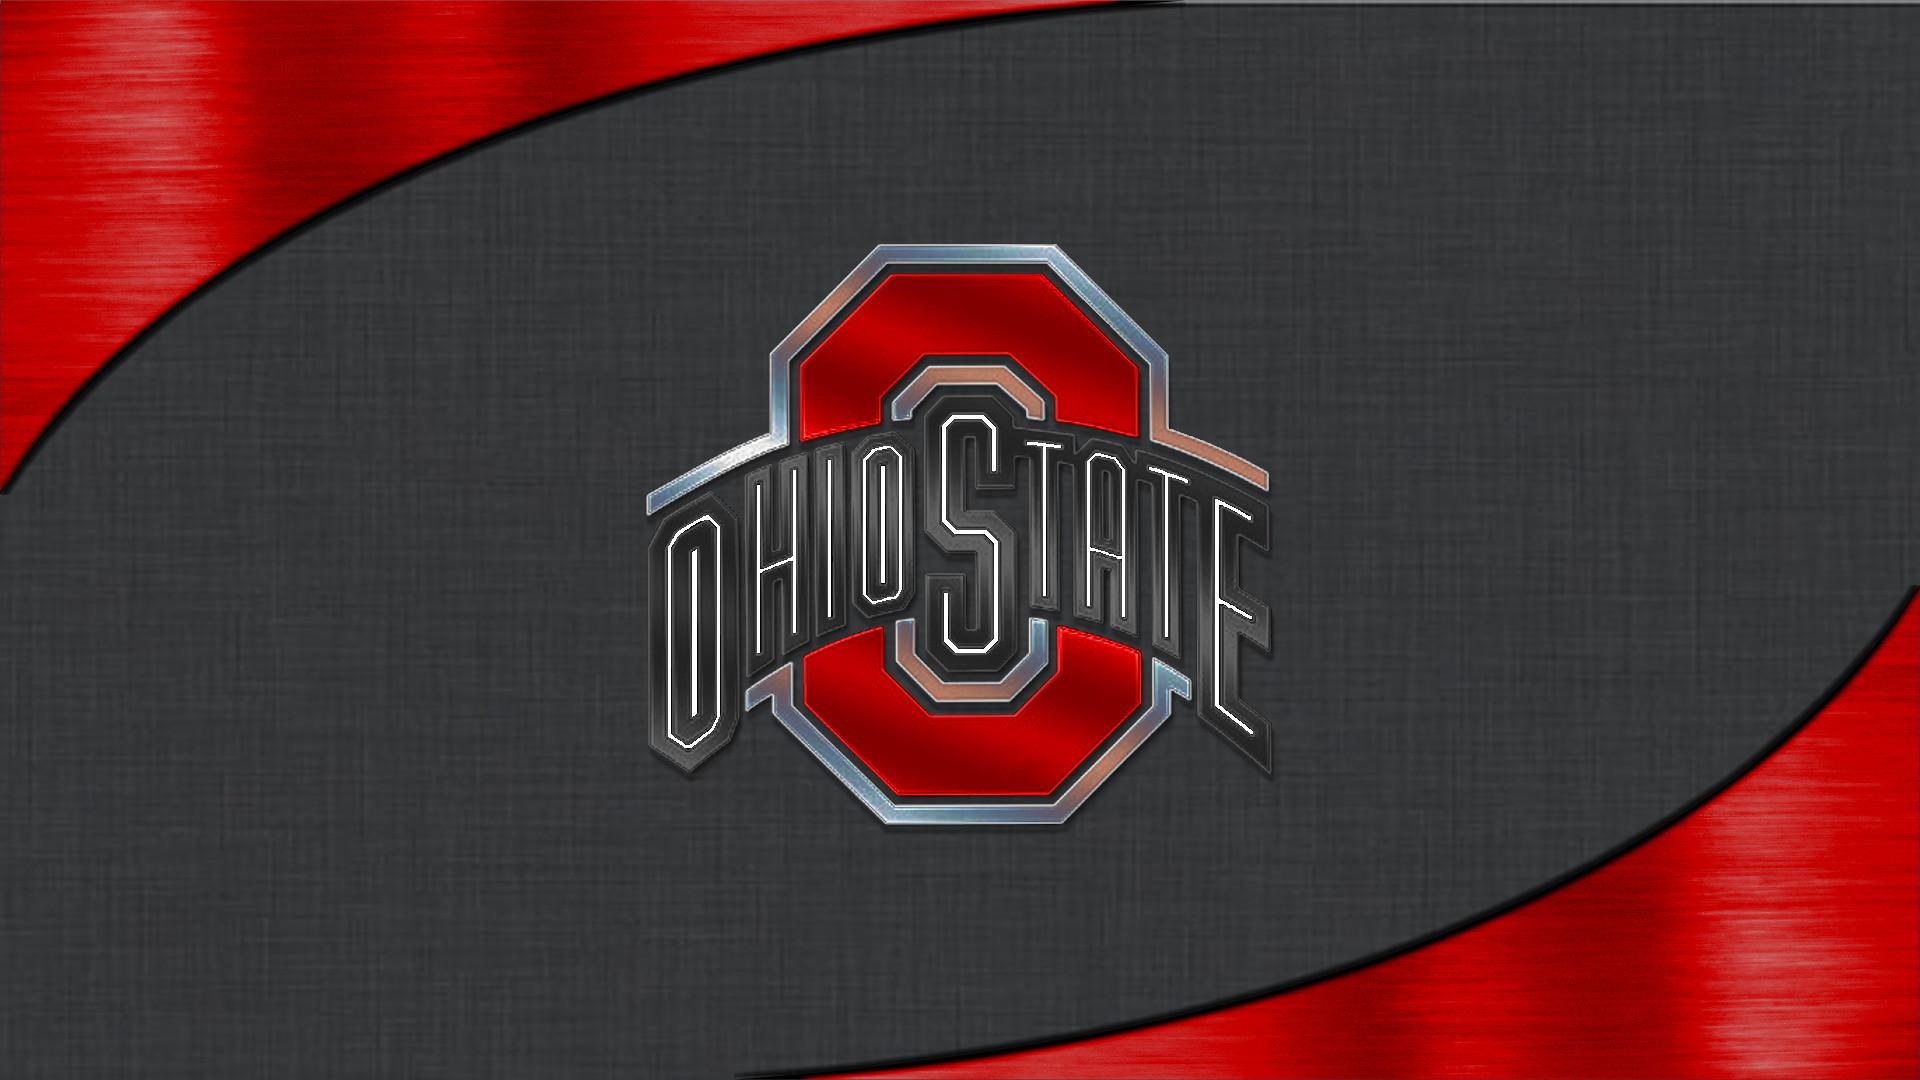 Ohio State Logo Wallpaper: Ohio State Wallpaper 1920x1080 (71+ Images